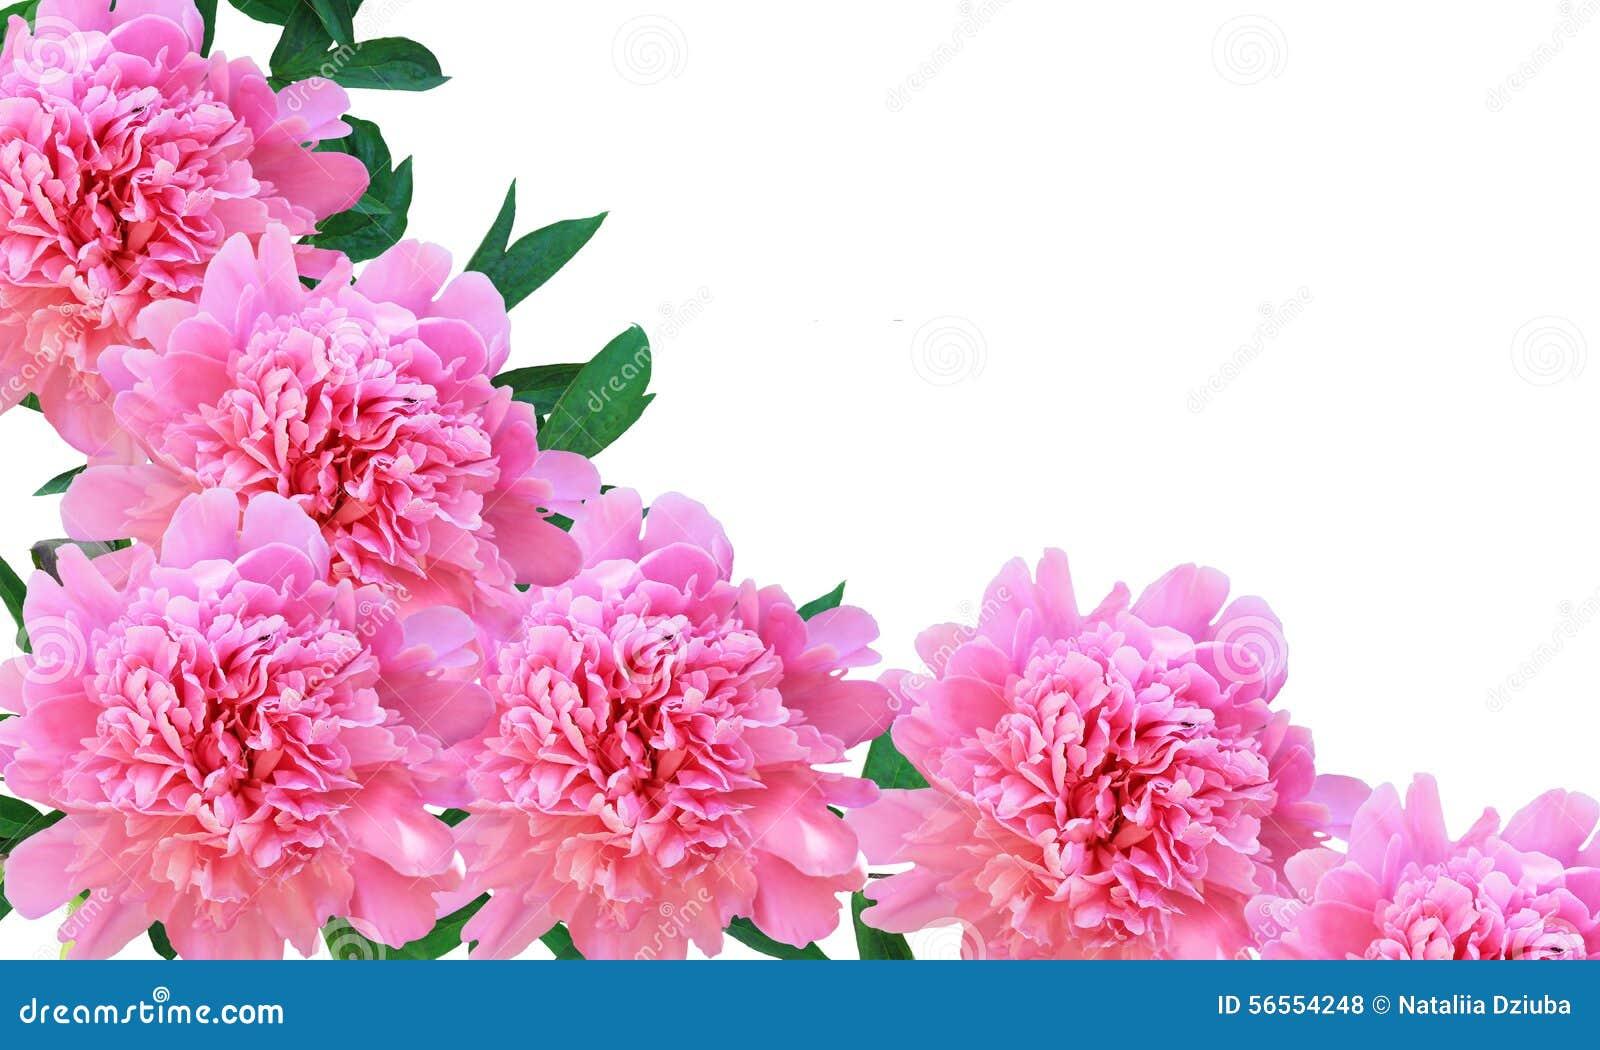 Download Απομονωμένα Peony λουλούδια με τα φύλλα Στοκ Εικόνες - εικόνα από πλαίσιο, αποκοπή: 56554248